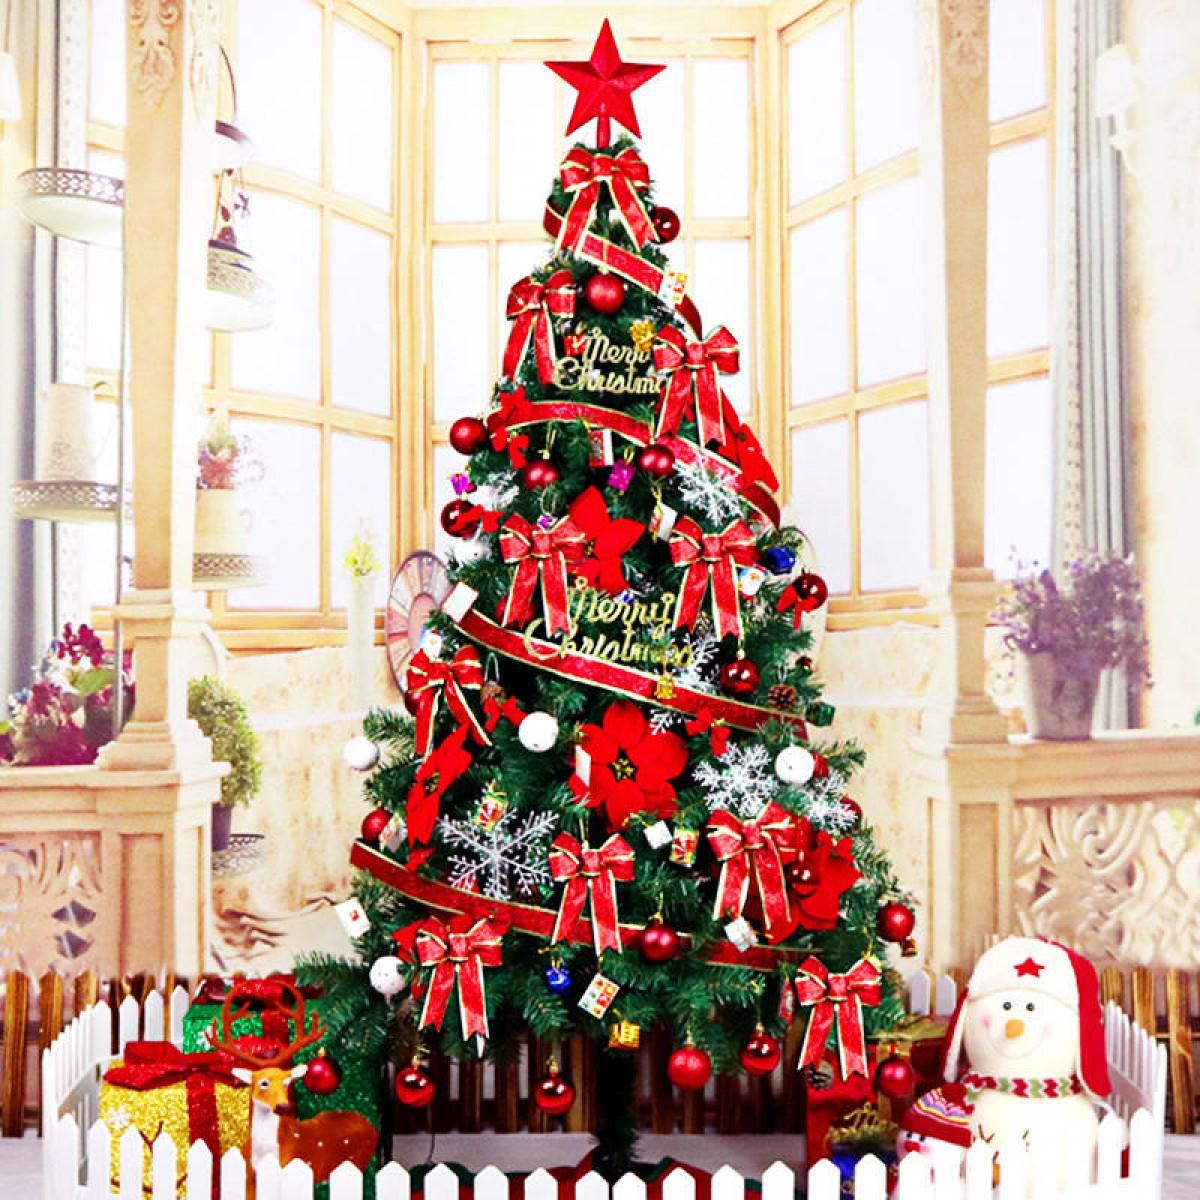 2 Christmas Tree.1 8m Christmas Tree With Decorations